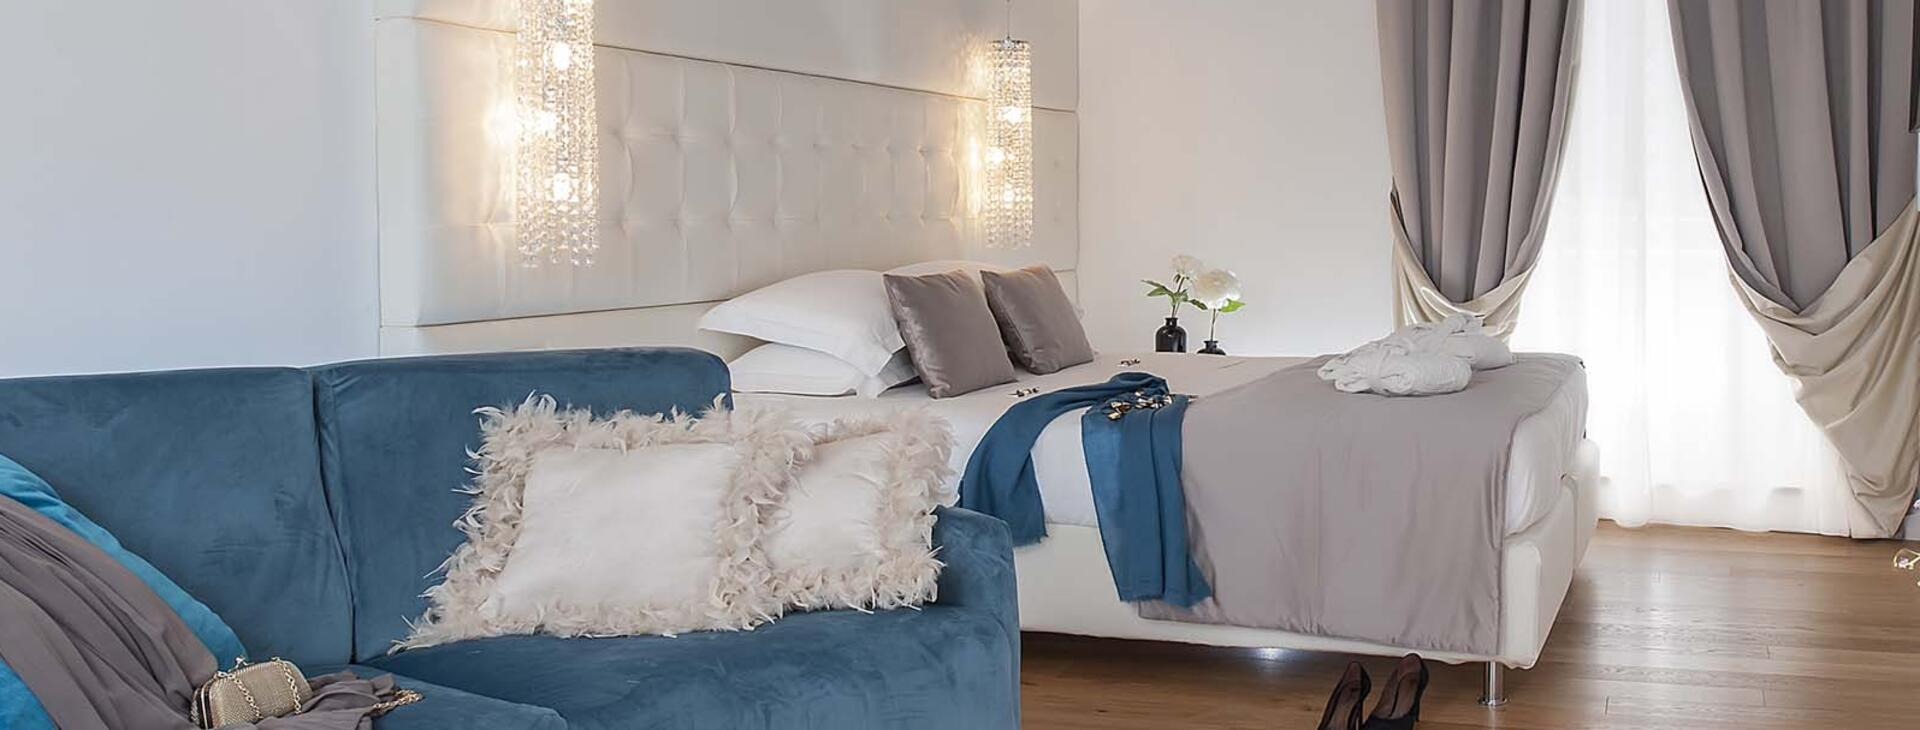 argentinastylehotel it suite 001